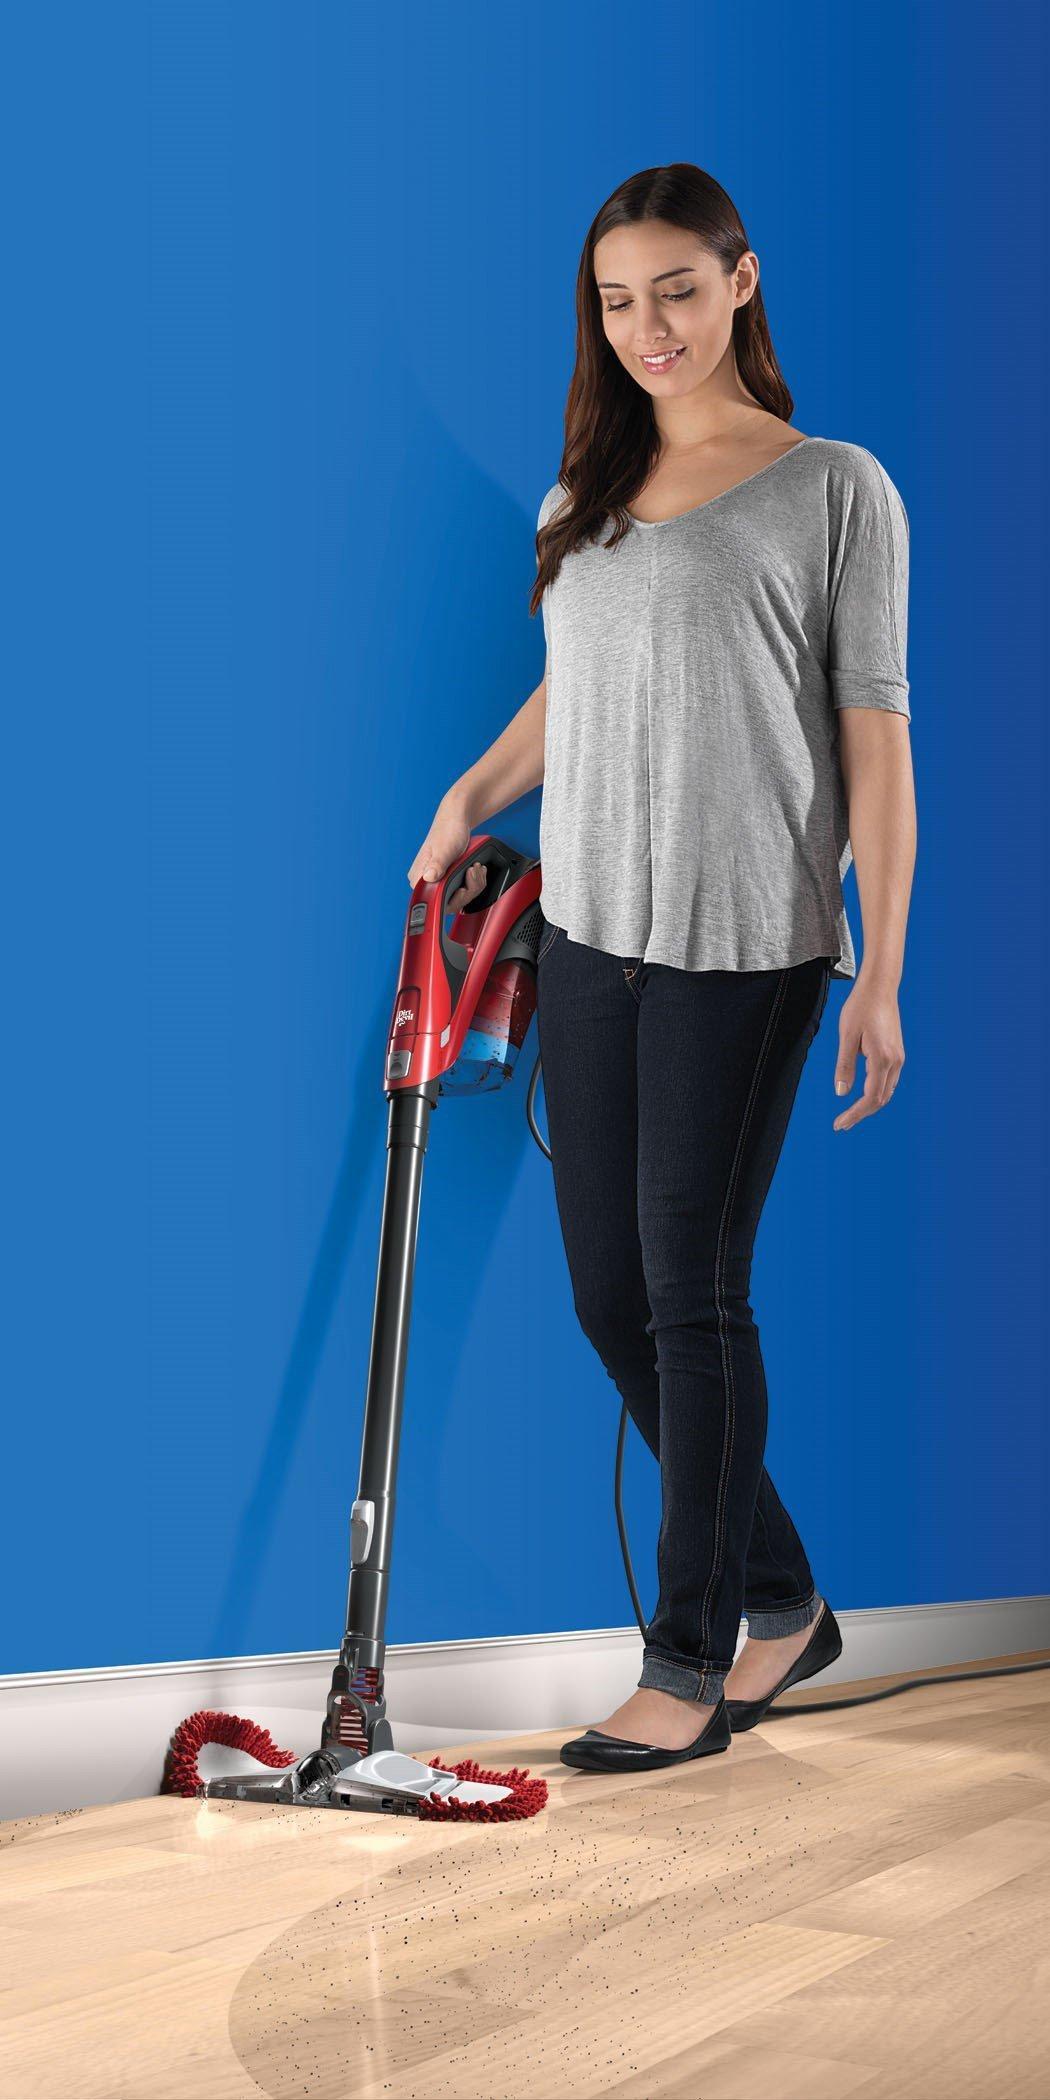 Reconditioned 360 Reach Pro Bagless Stick Vacuum3